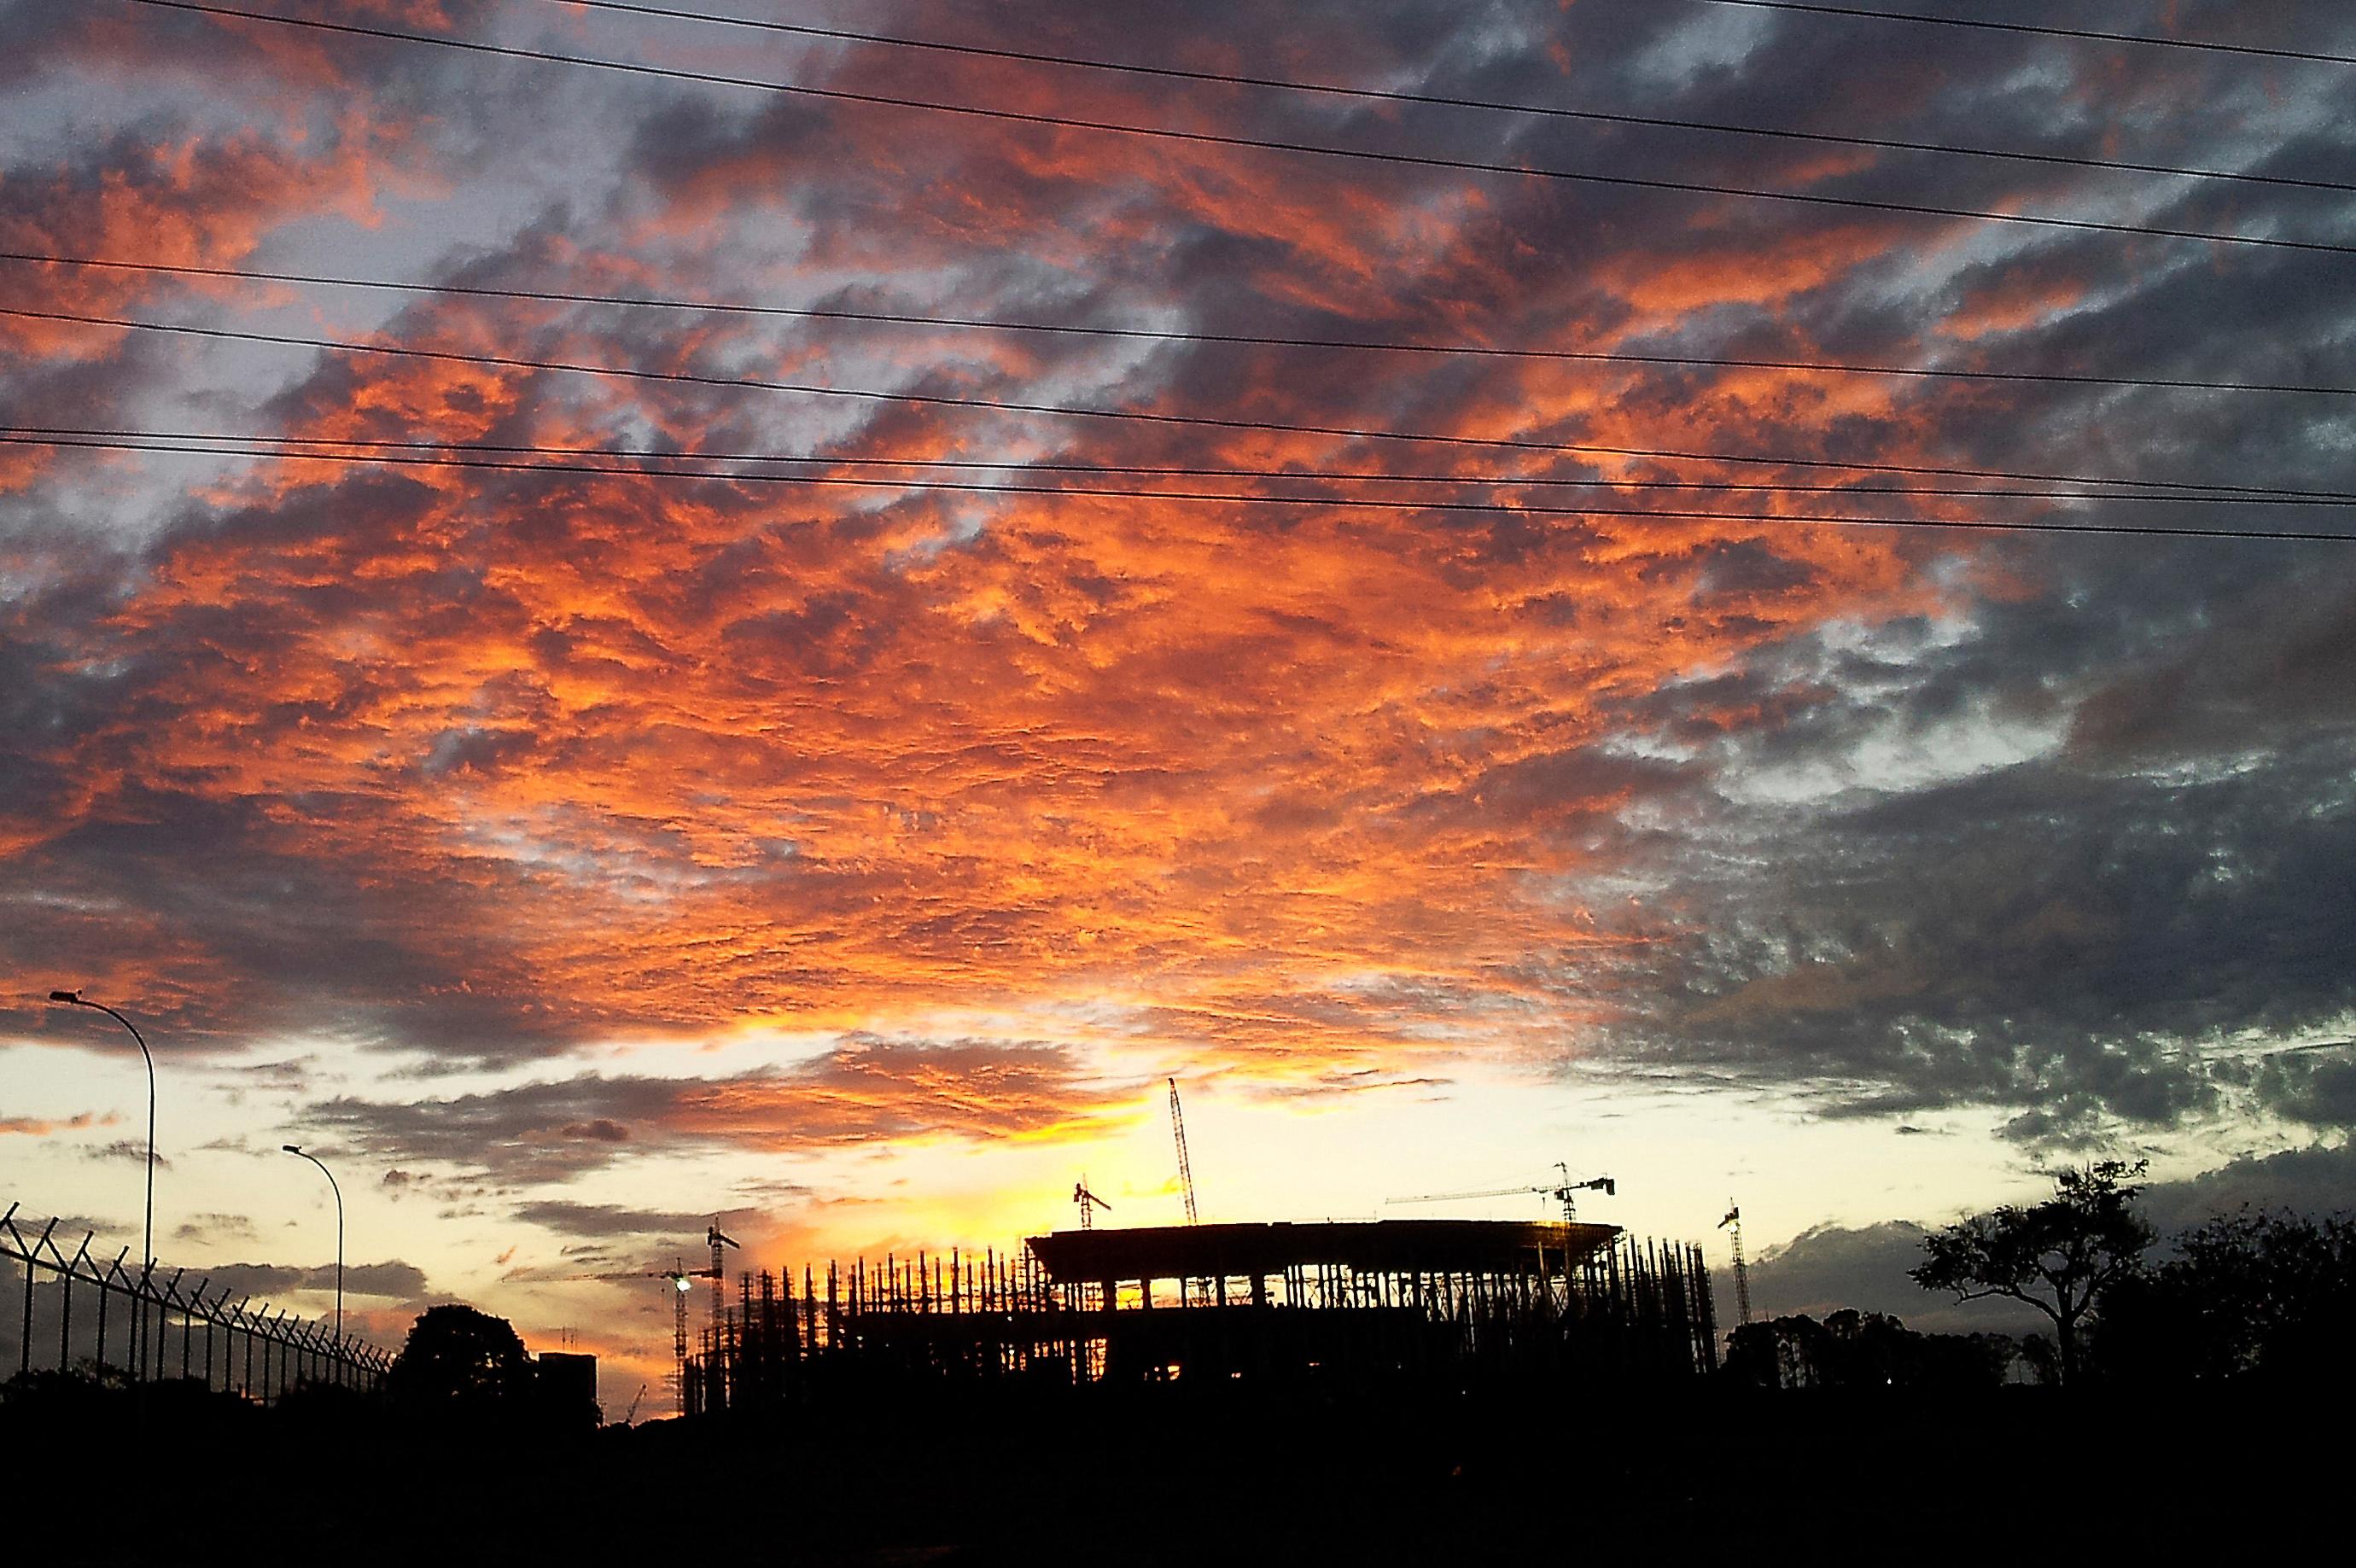 Est dio nacional de bras lia ag ncia brasil for Puerta 27 estadio nacional